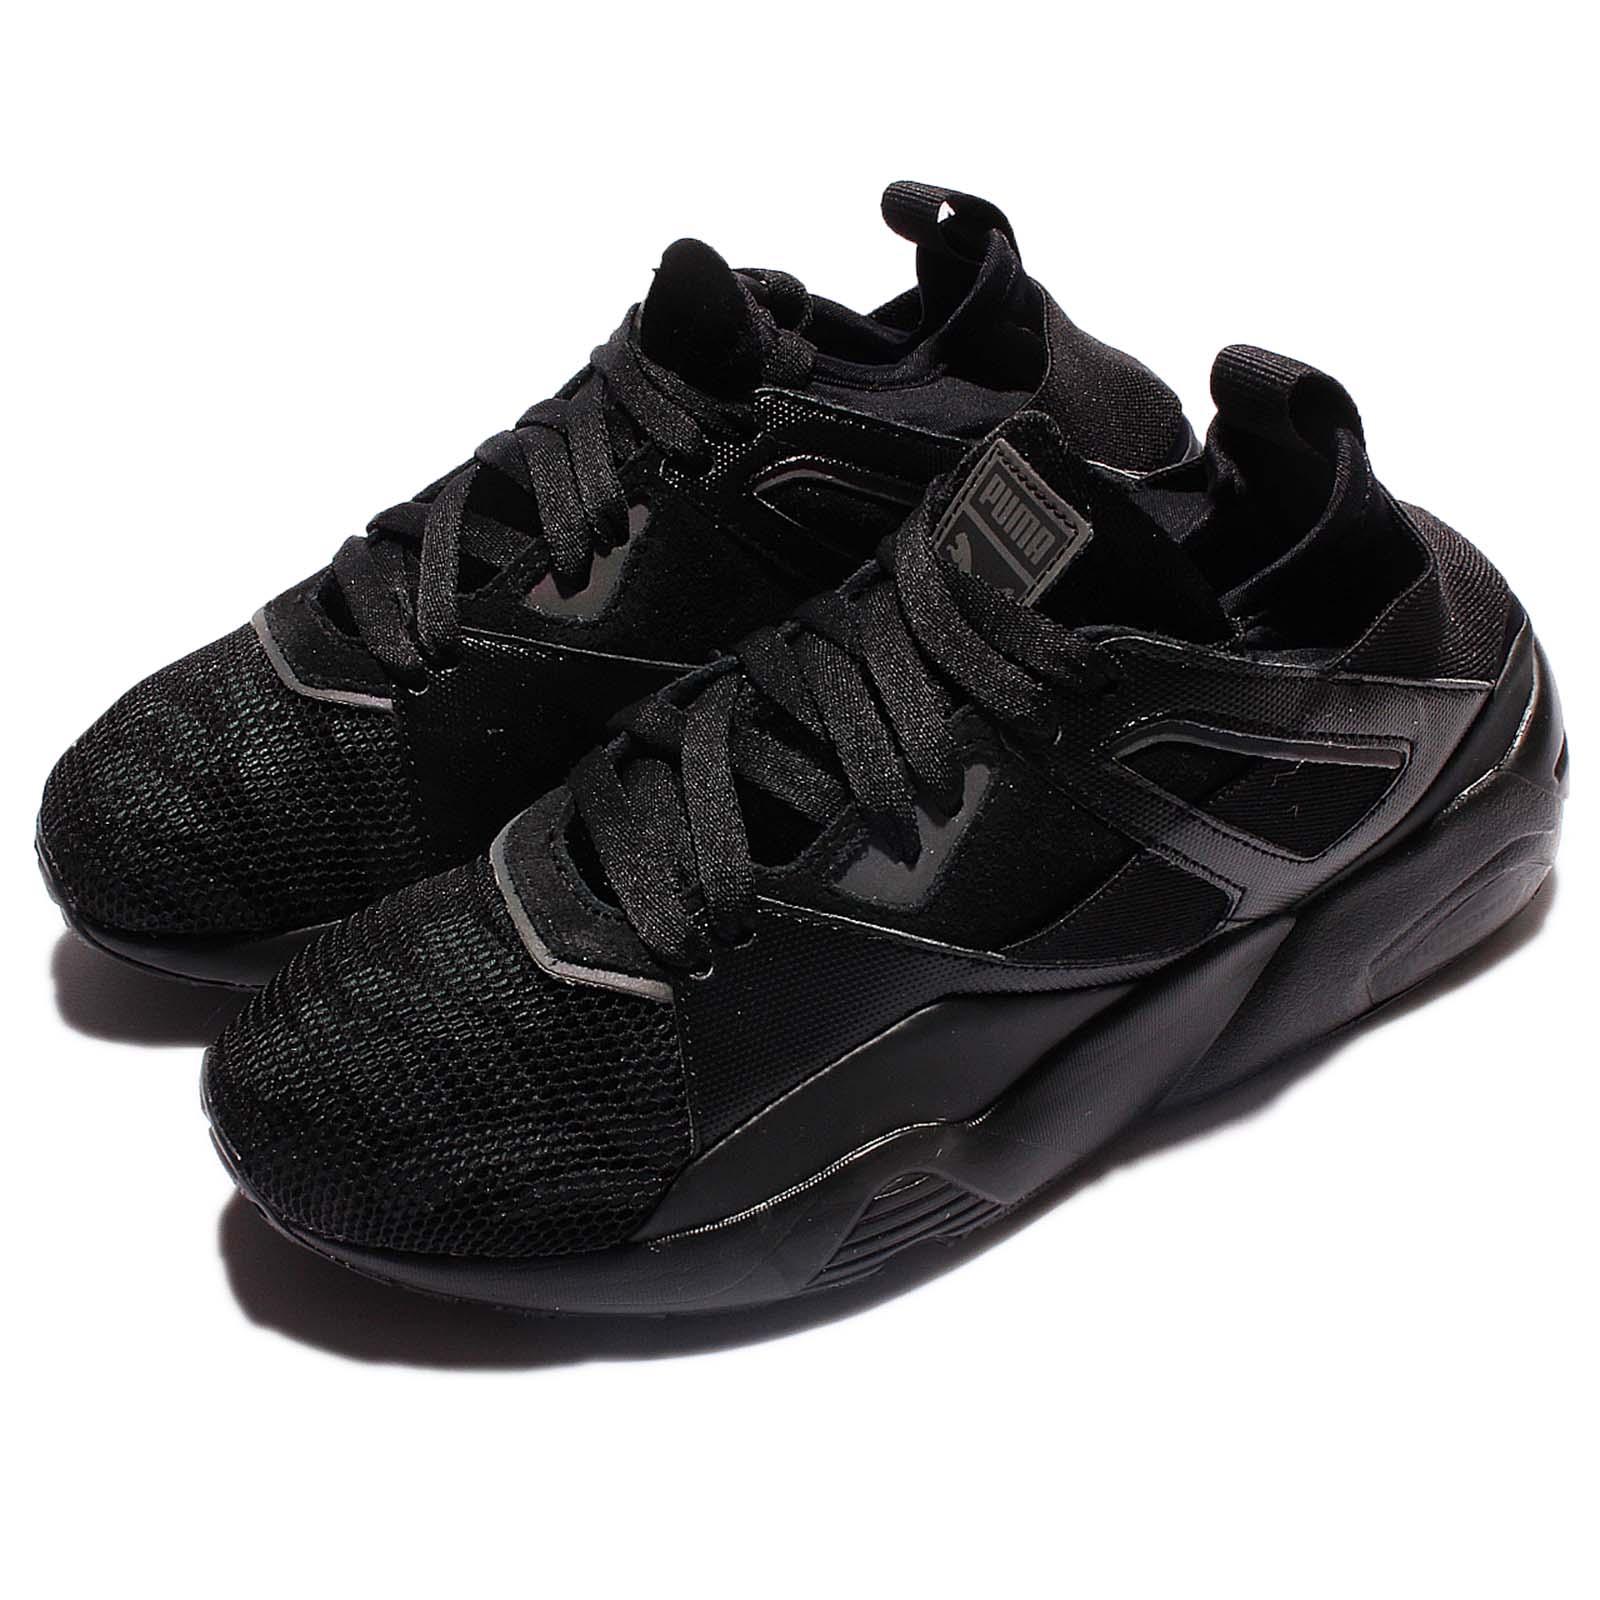 Puma 休閒鞋 B.O.G Sock Swan 穿搭 女鞋 36343001